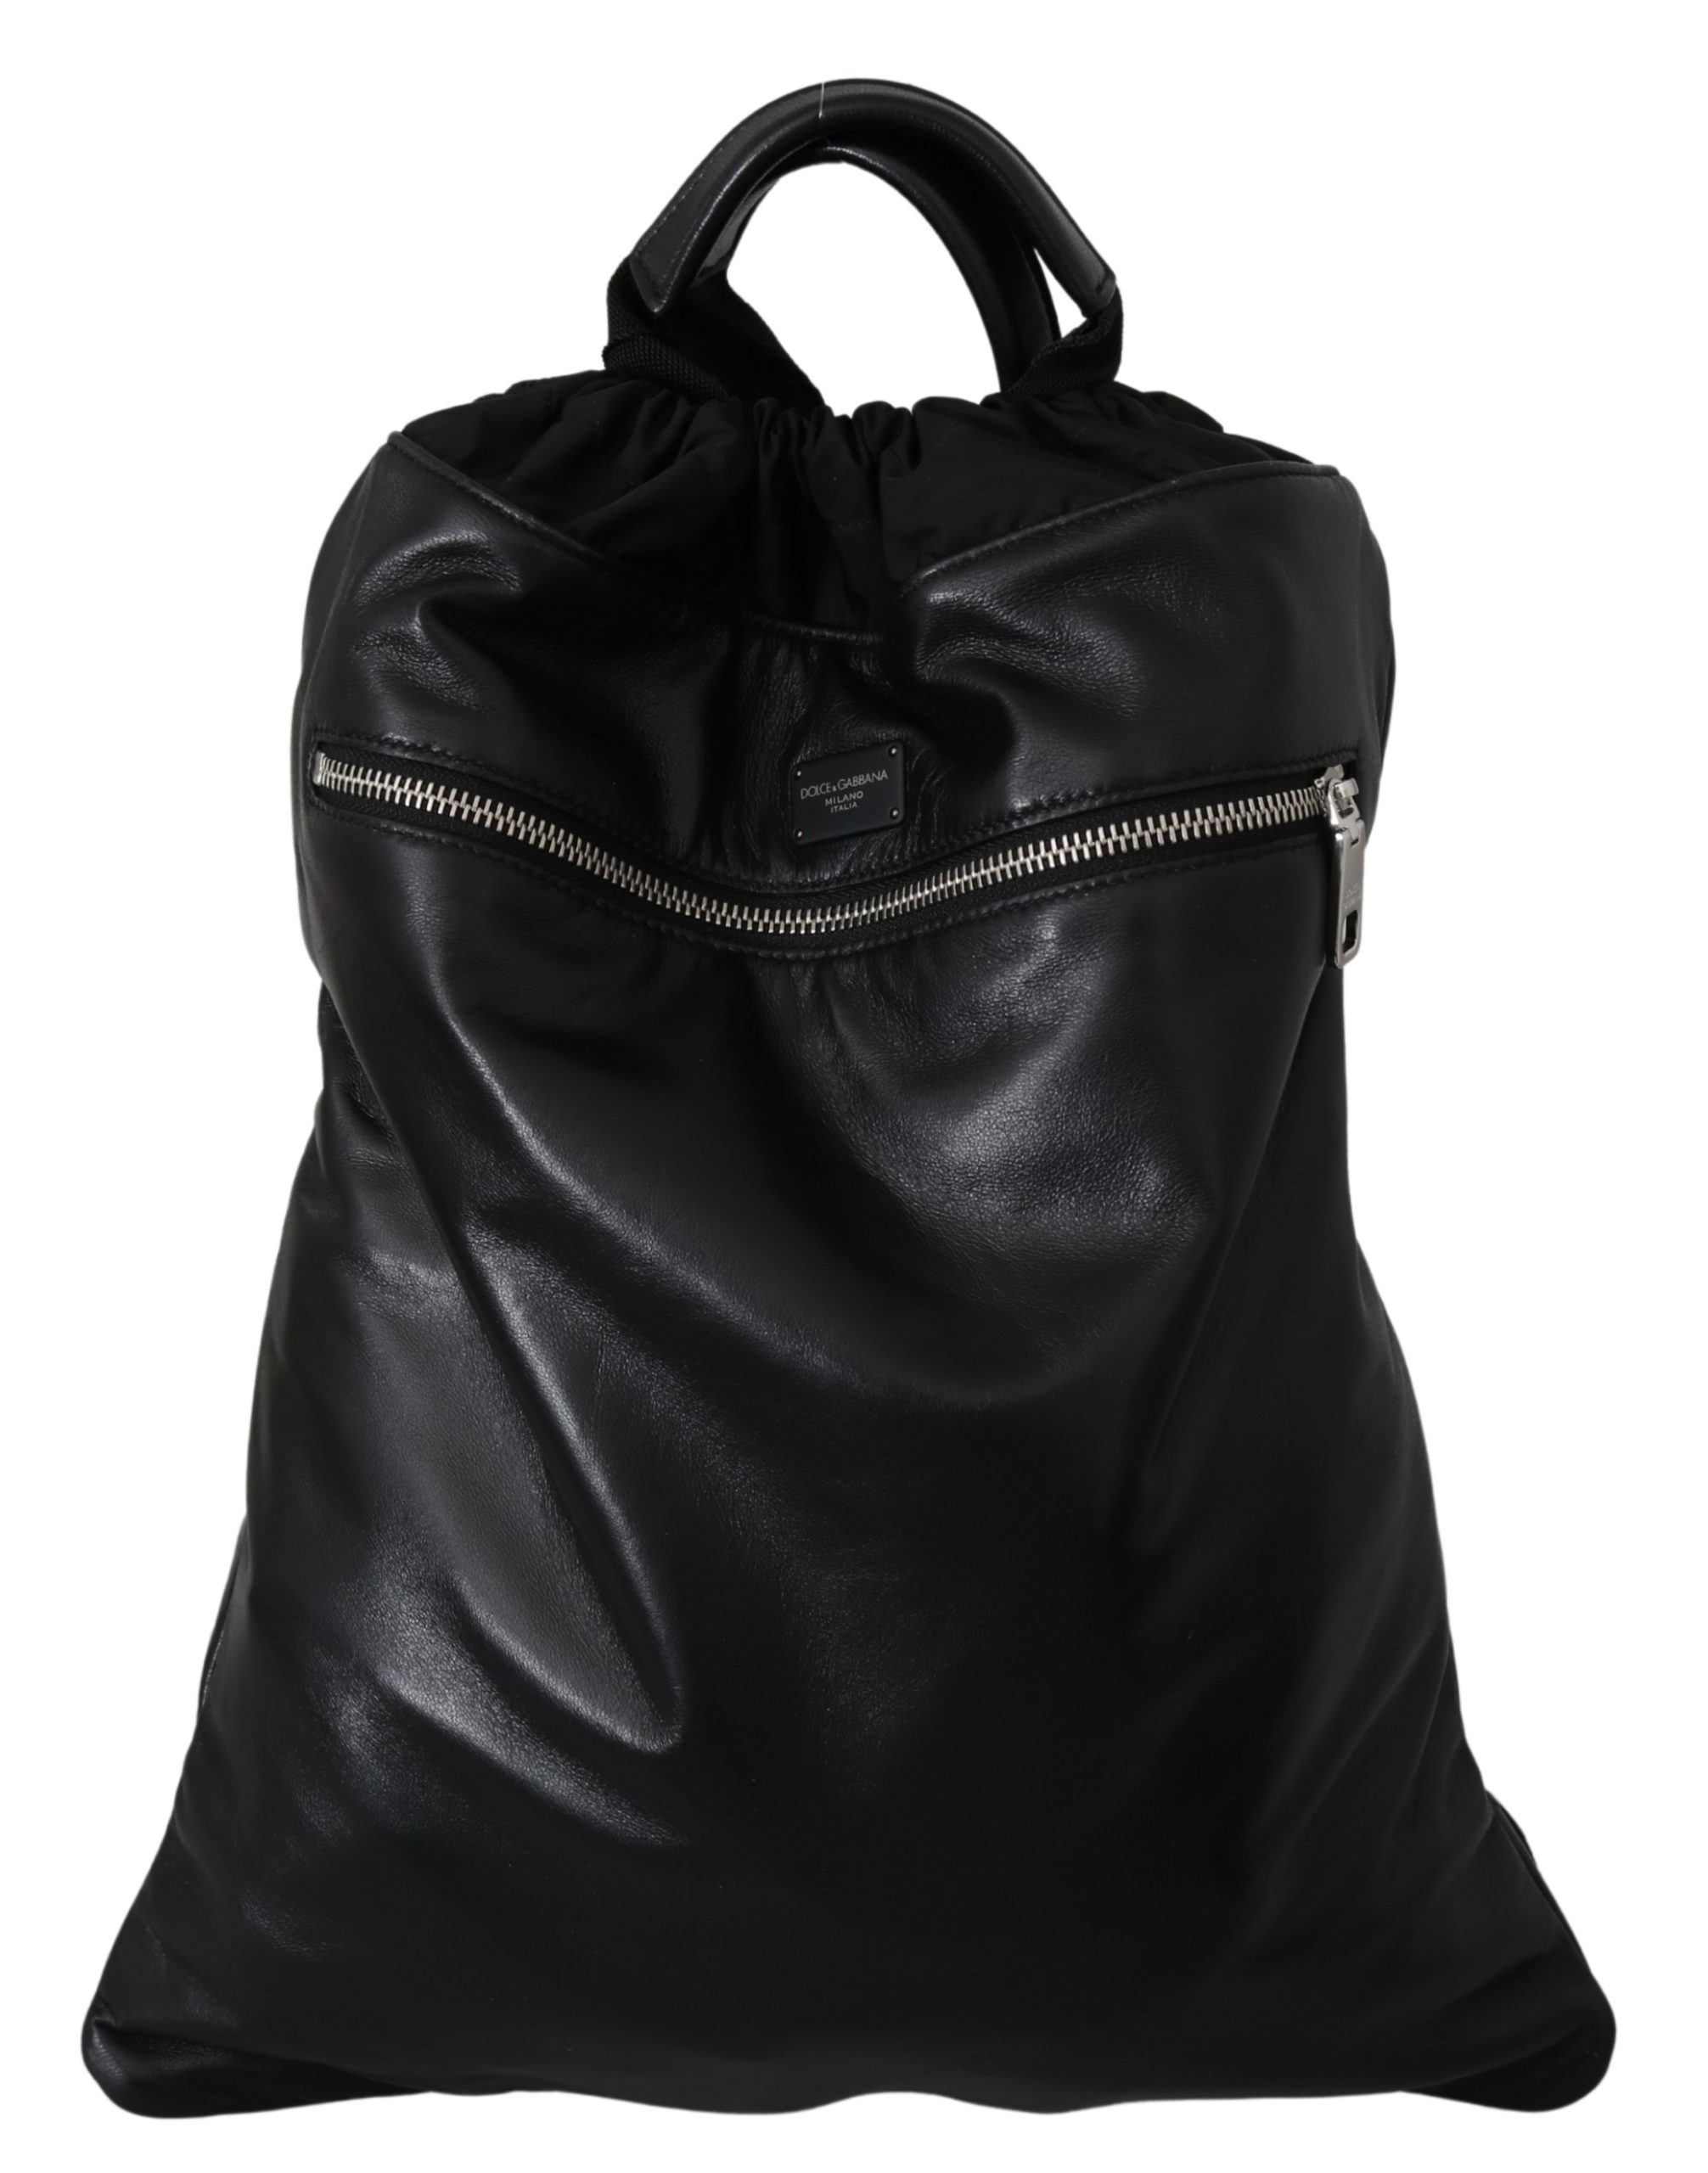 Dolce & Gabbana Men's Leather Drawstring Backpack Black VAS10043